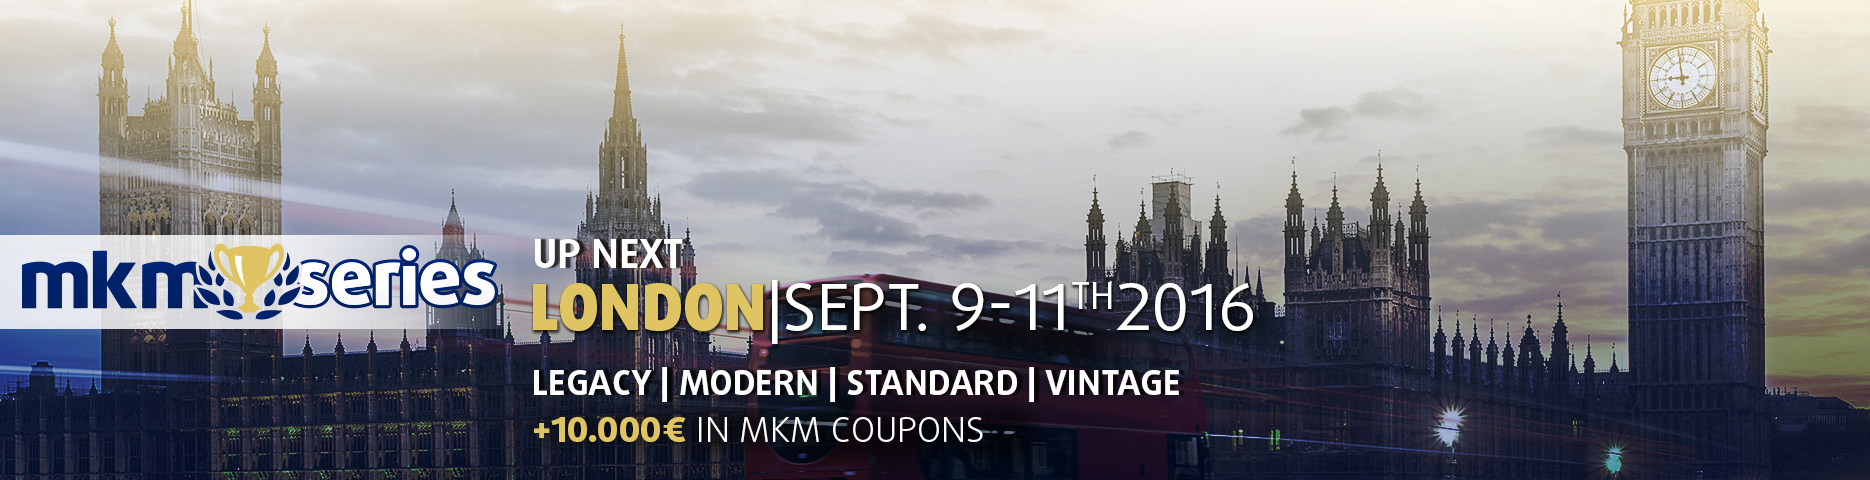 MKM Series London 2016 Coverage